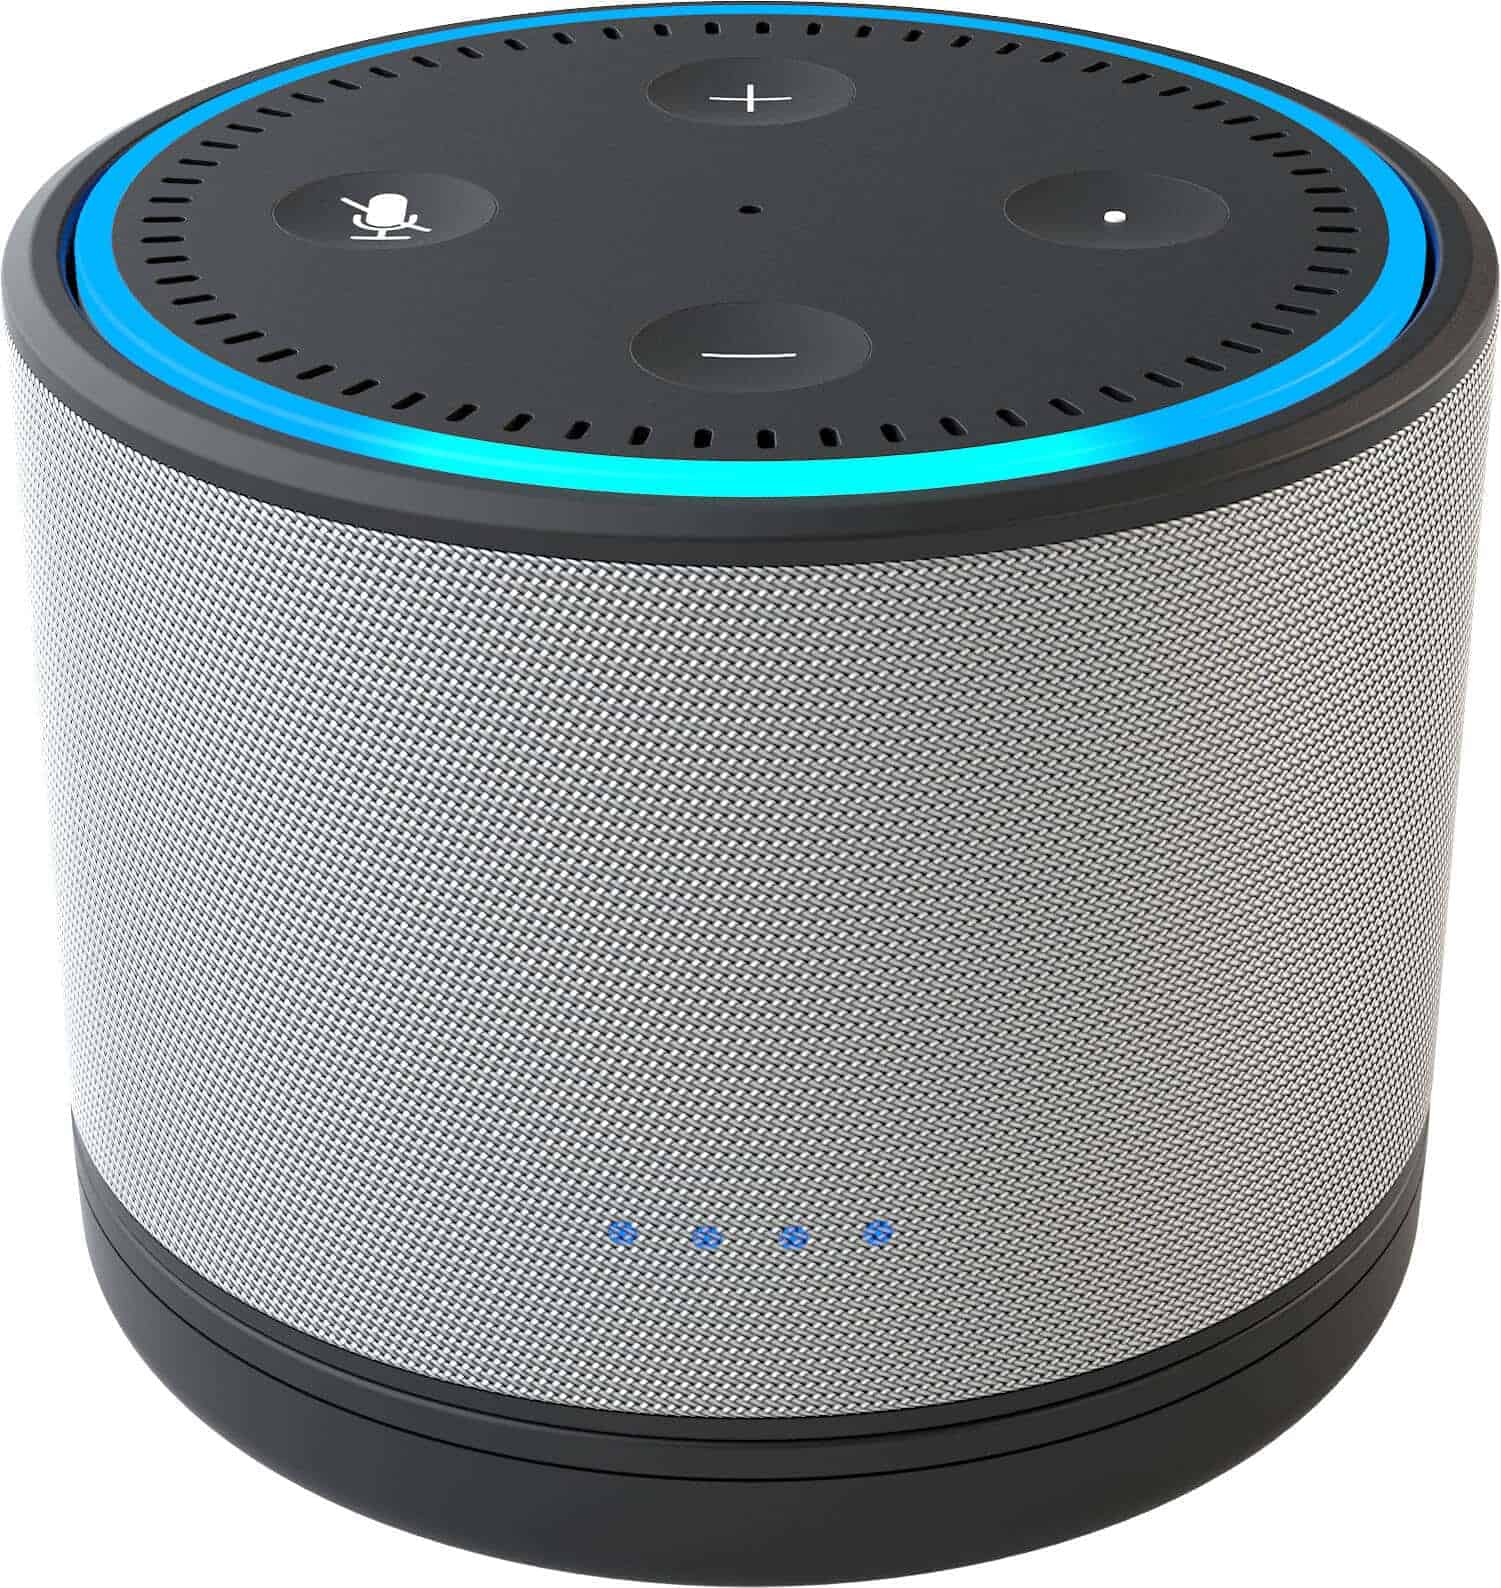 DOX Battery Base For Echo Dot 1